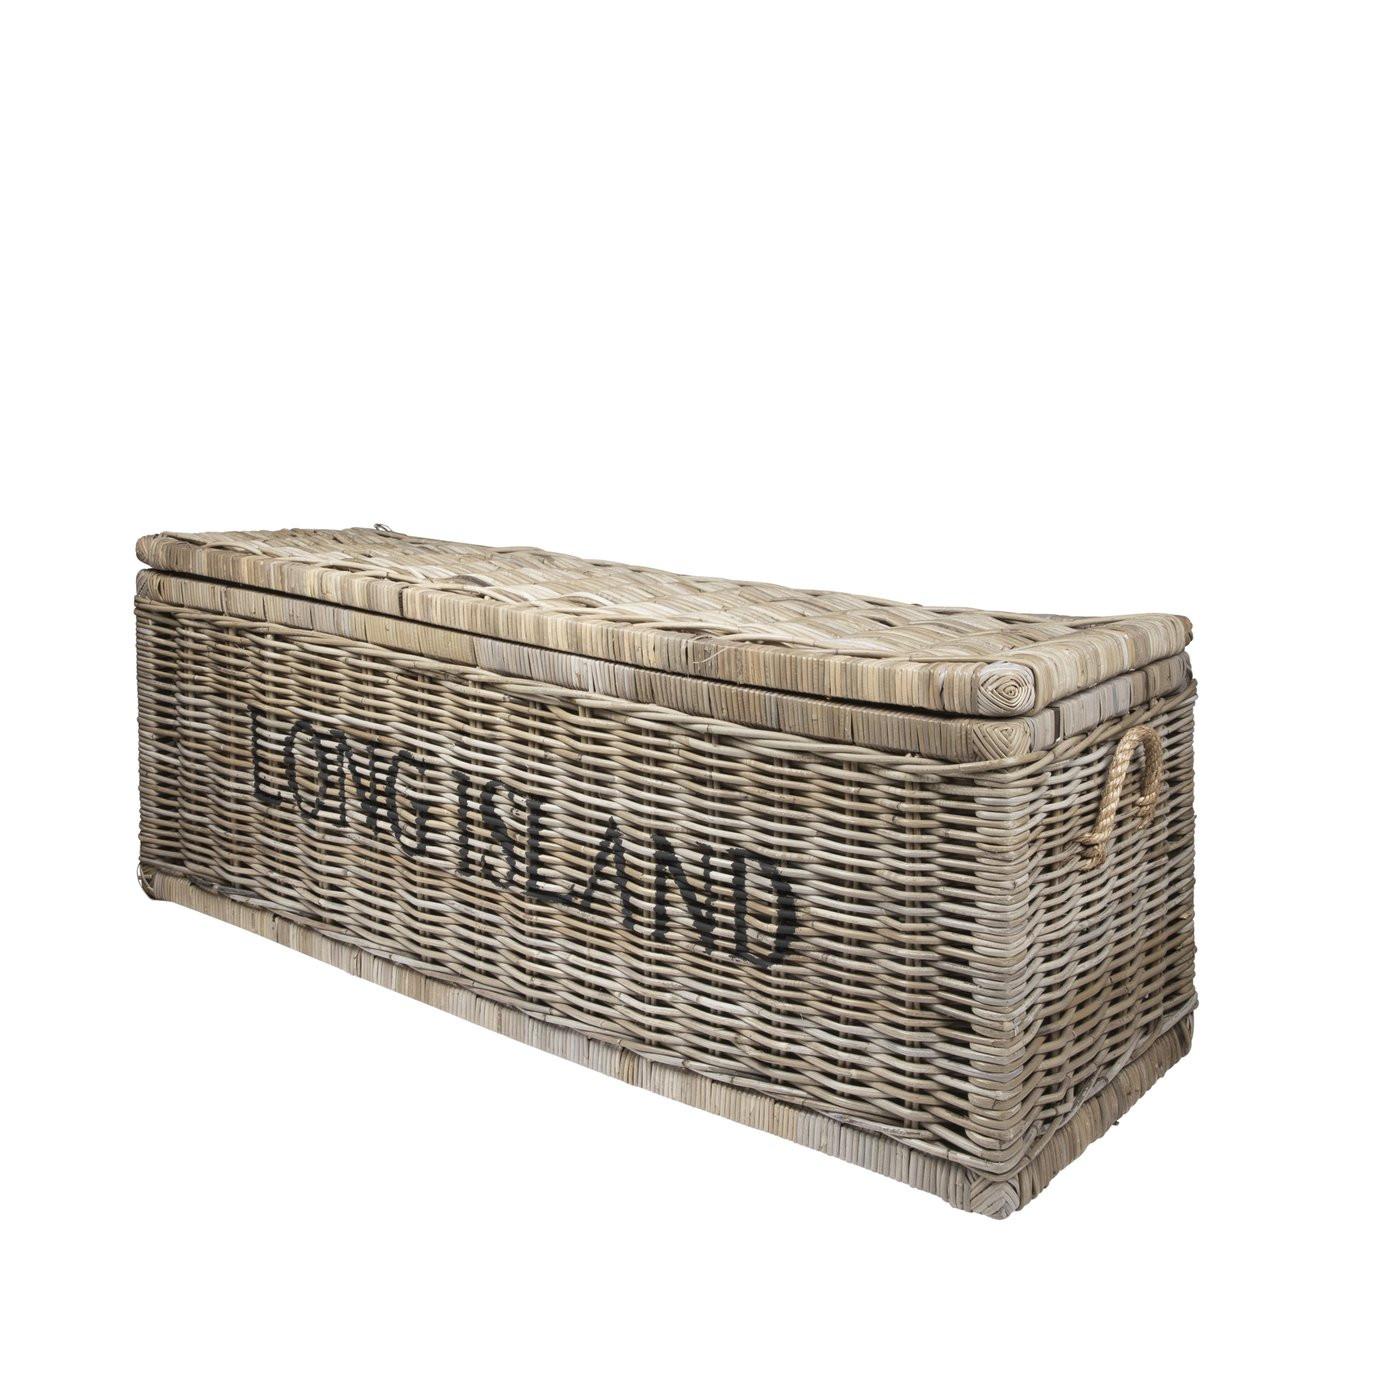 Gruenzimmer_long-island-truhe_mit-handgriffen_rattan-rightside_120x45x45cm